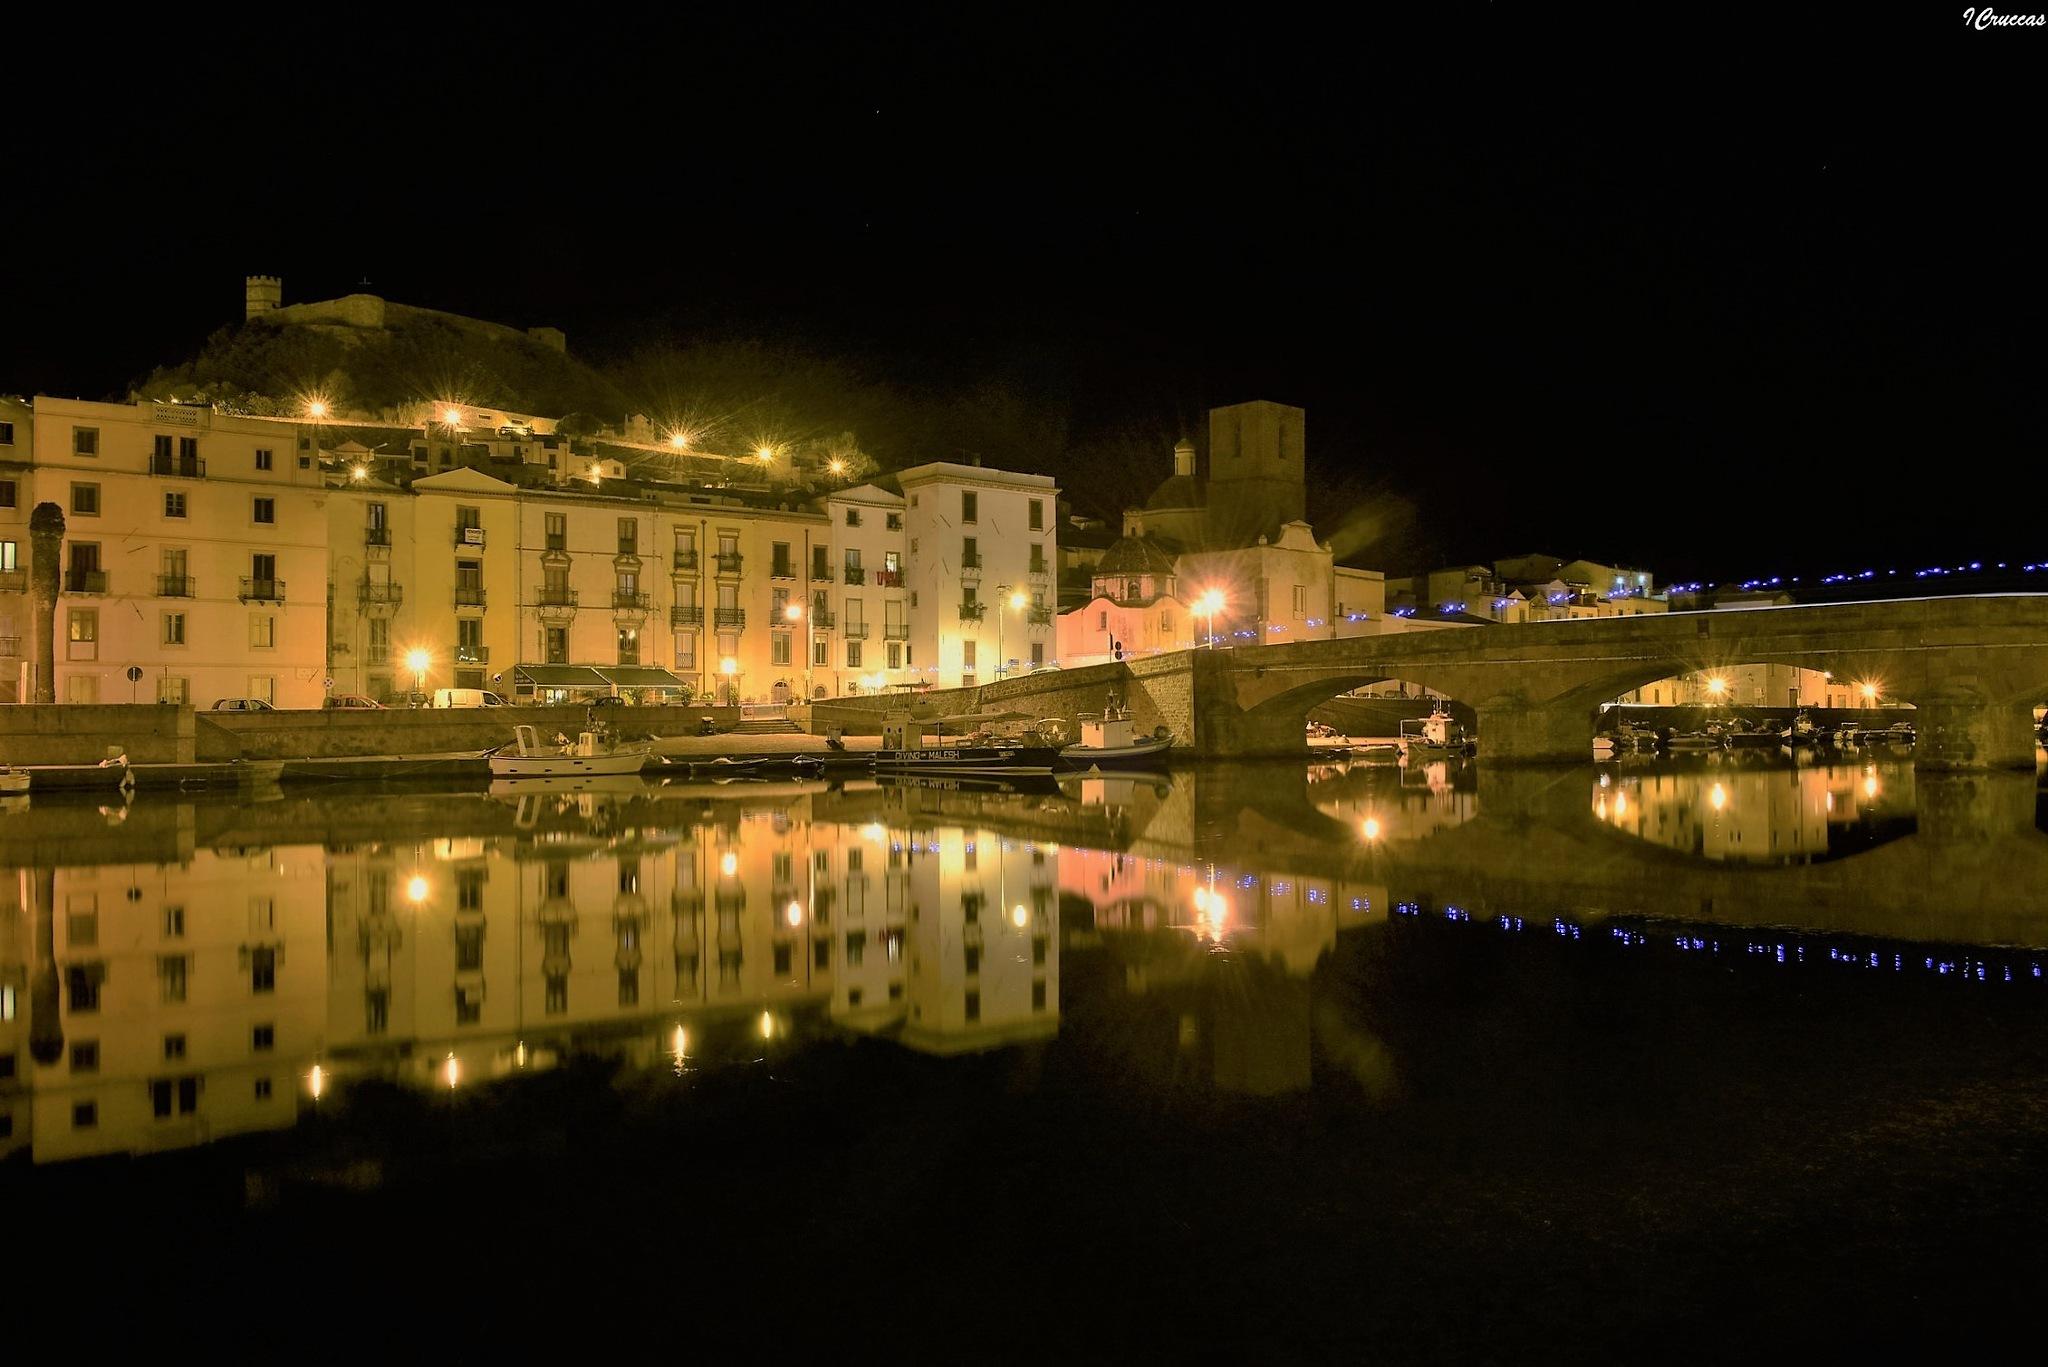 Bosa (Sardinya) Italy, by night by ignazio cruccas